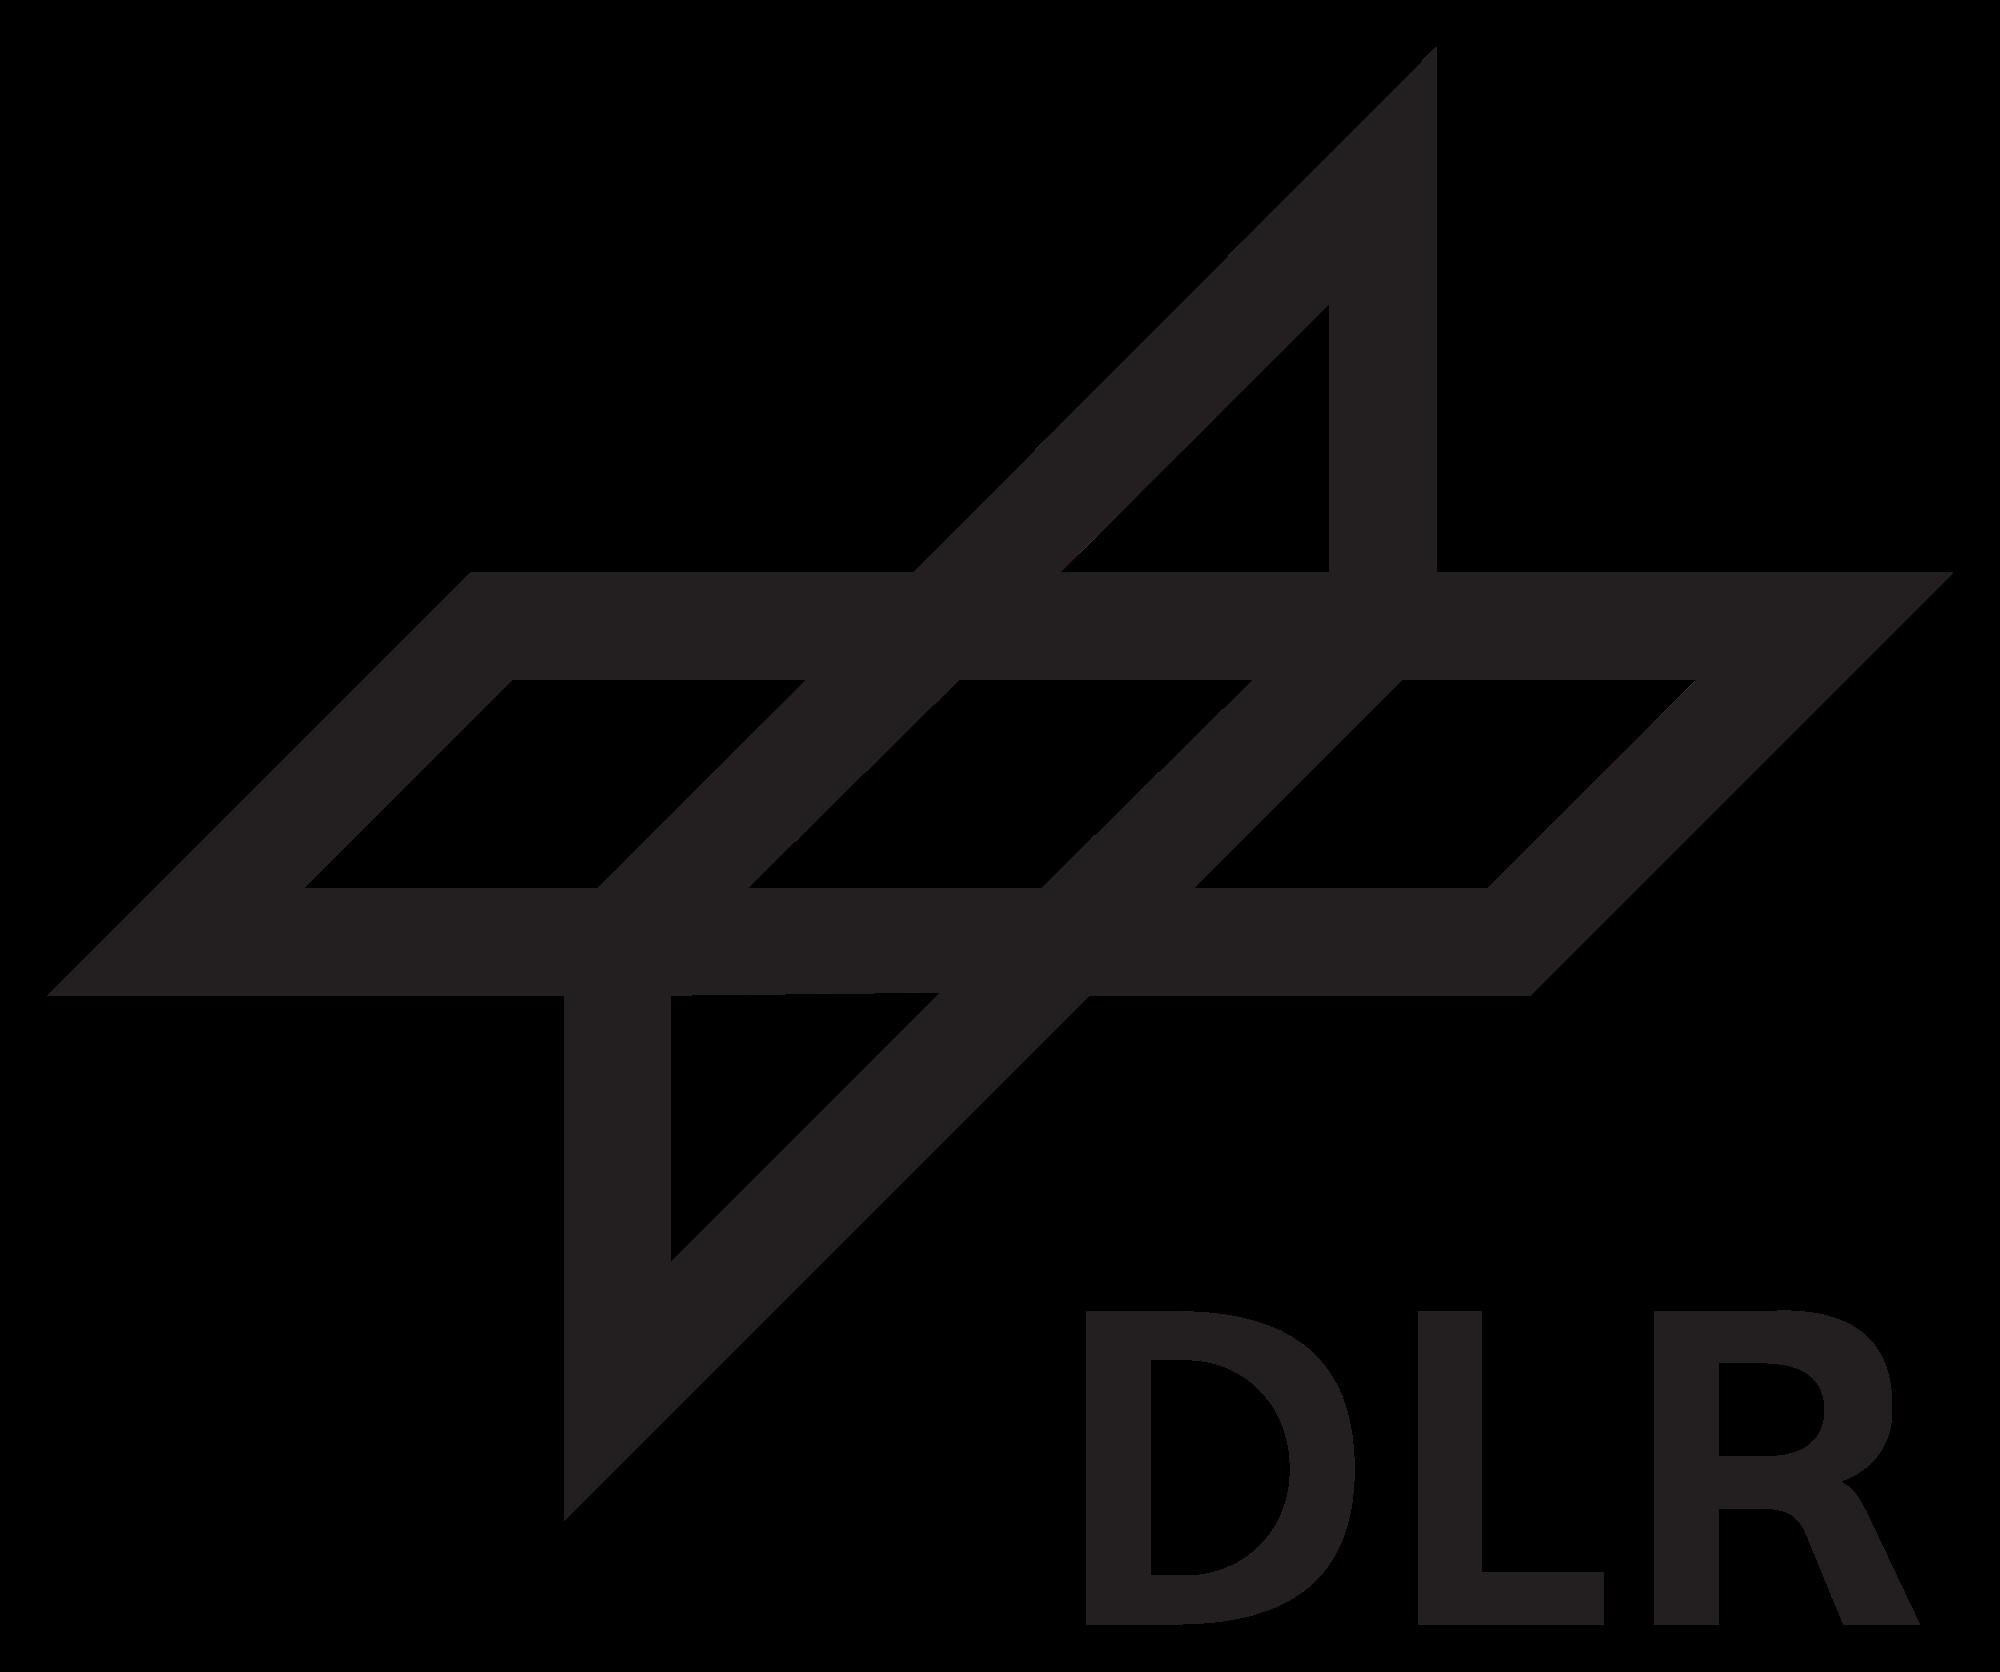 DLR_Logosvg.png